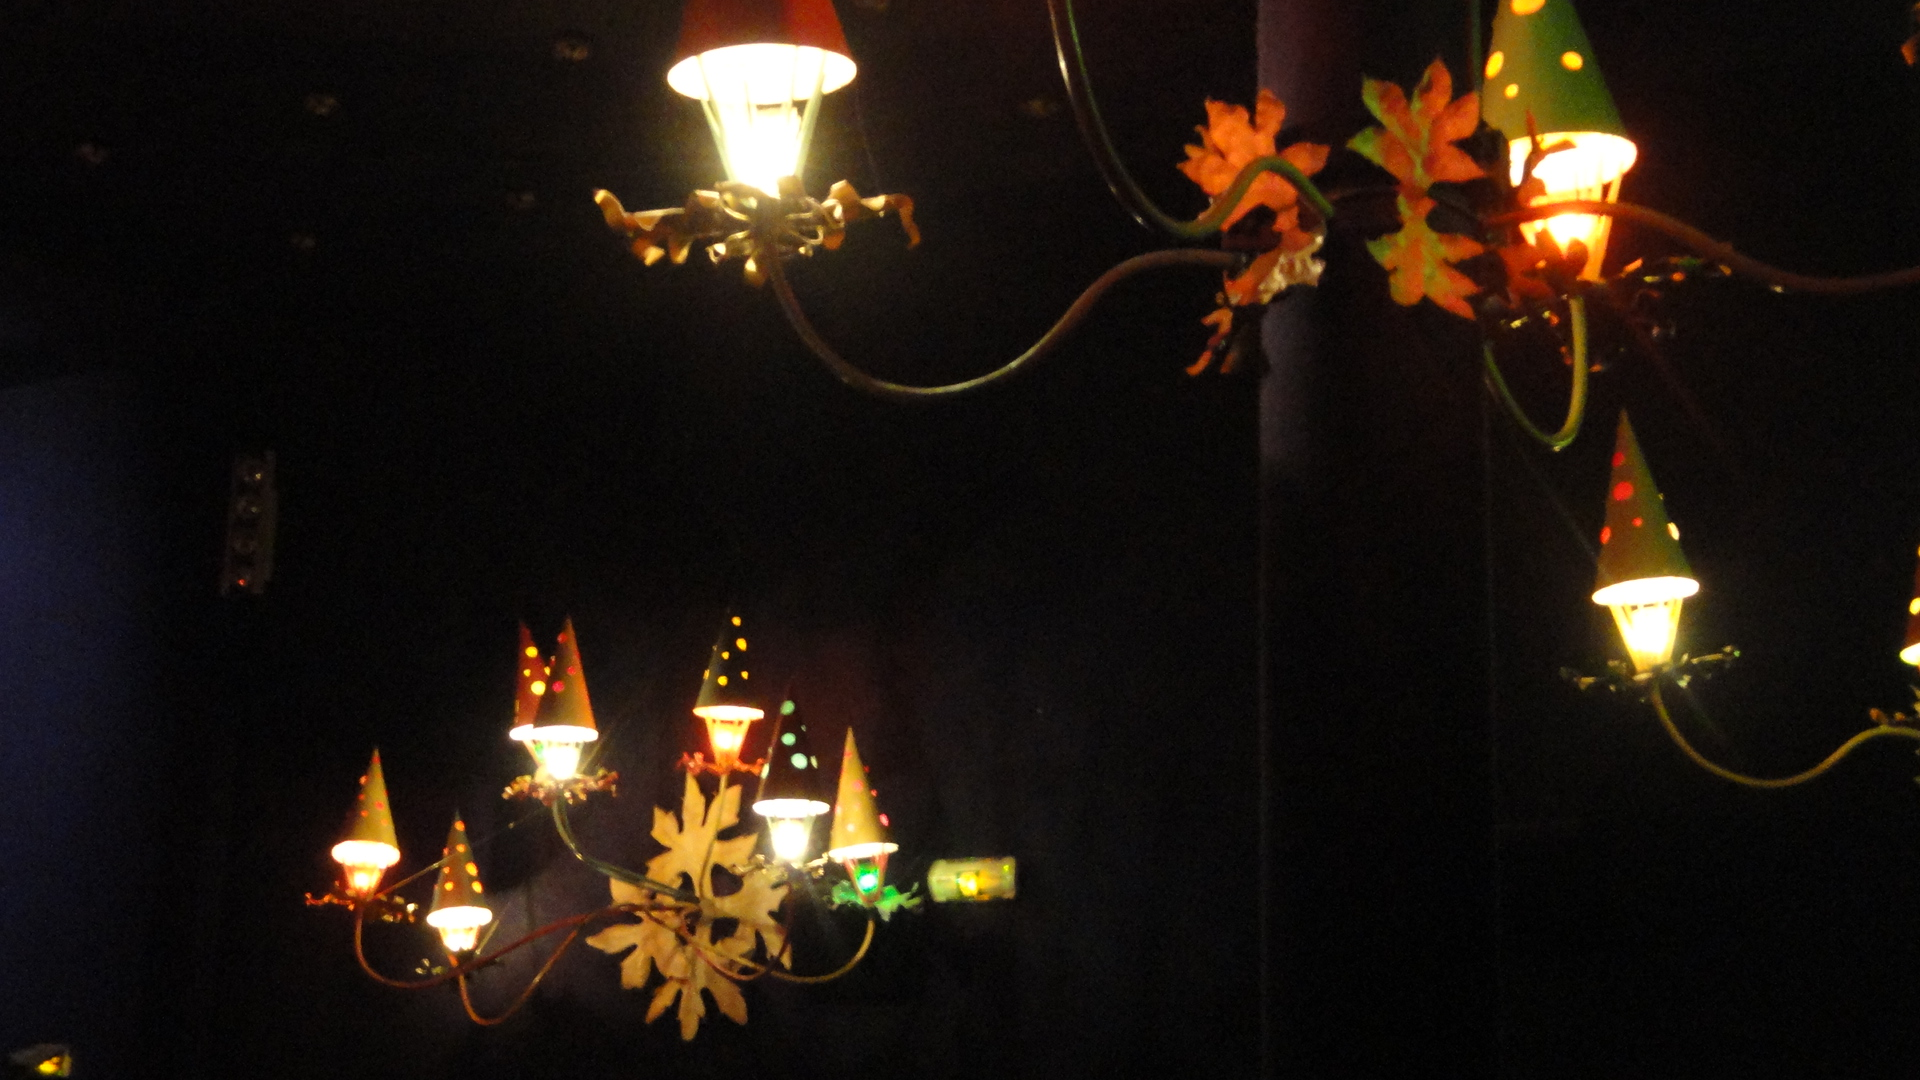 Studio 28 - Luminaires de Cocteau